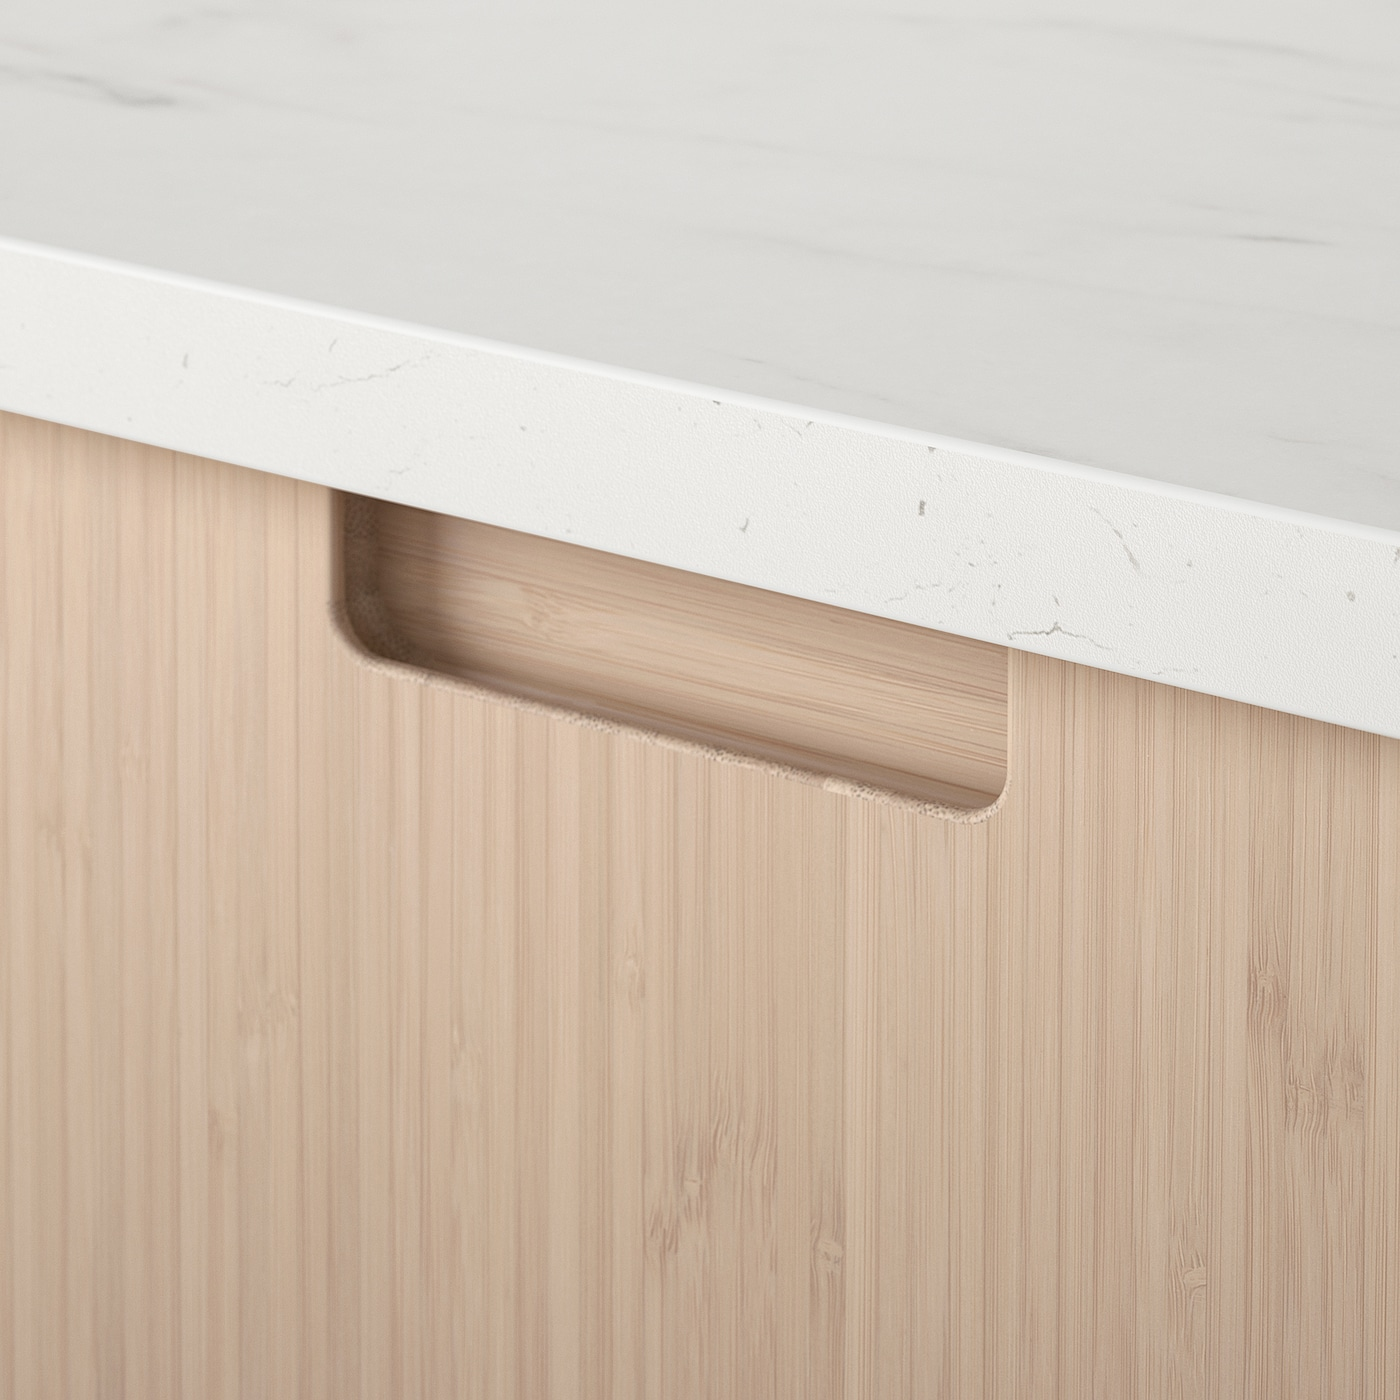 "FRÖJERED Drawer front, light bamboo, 18x10 """